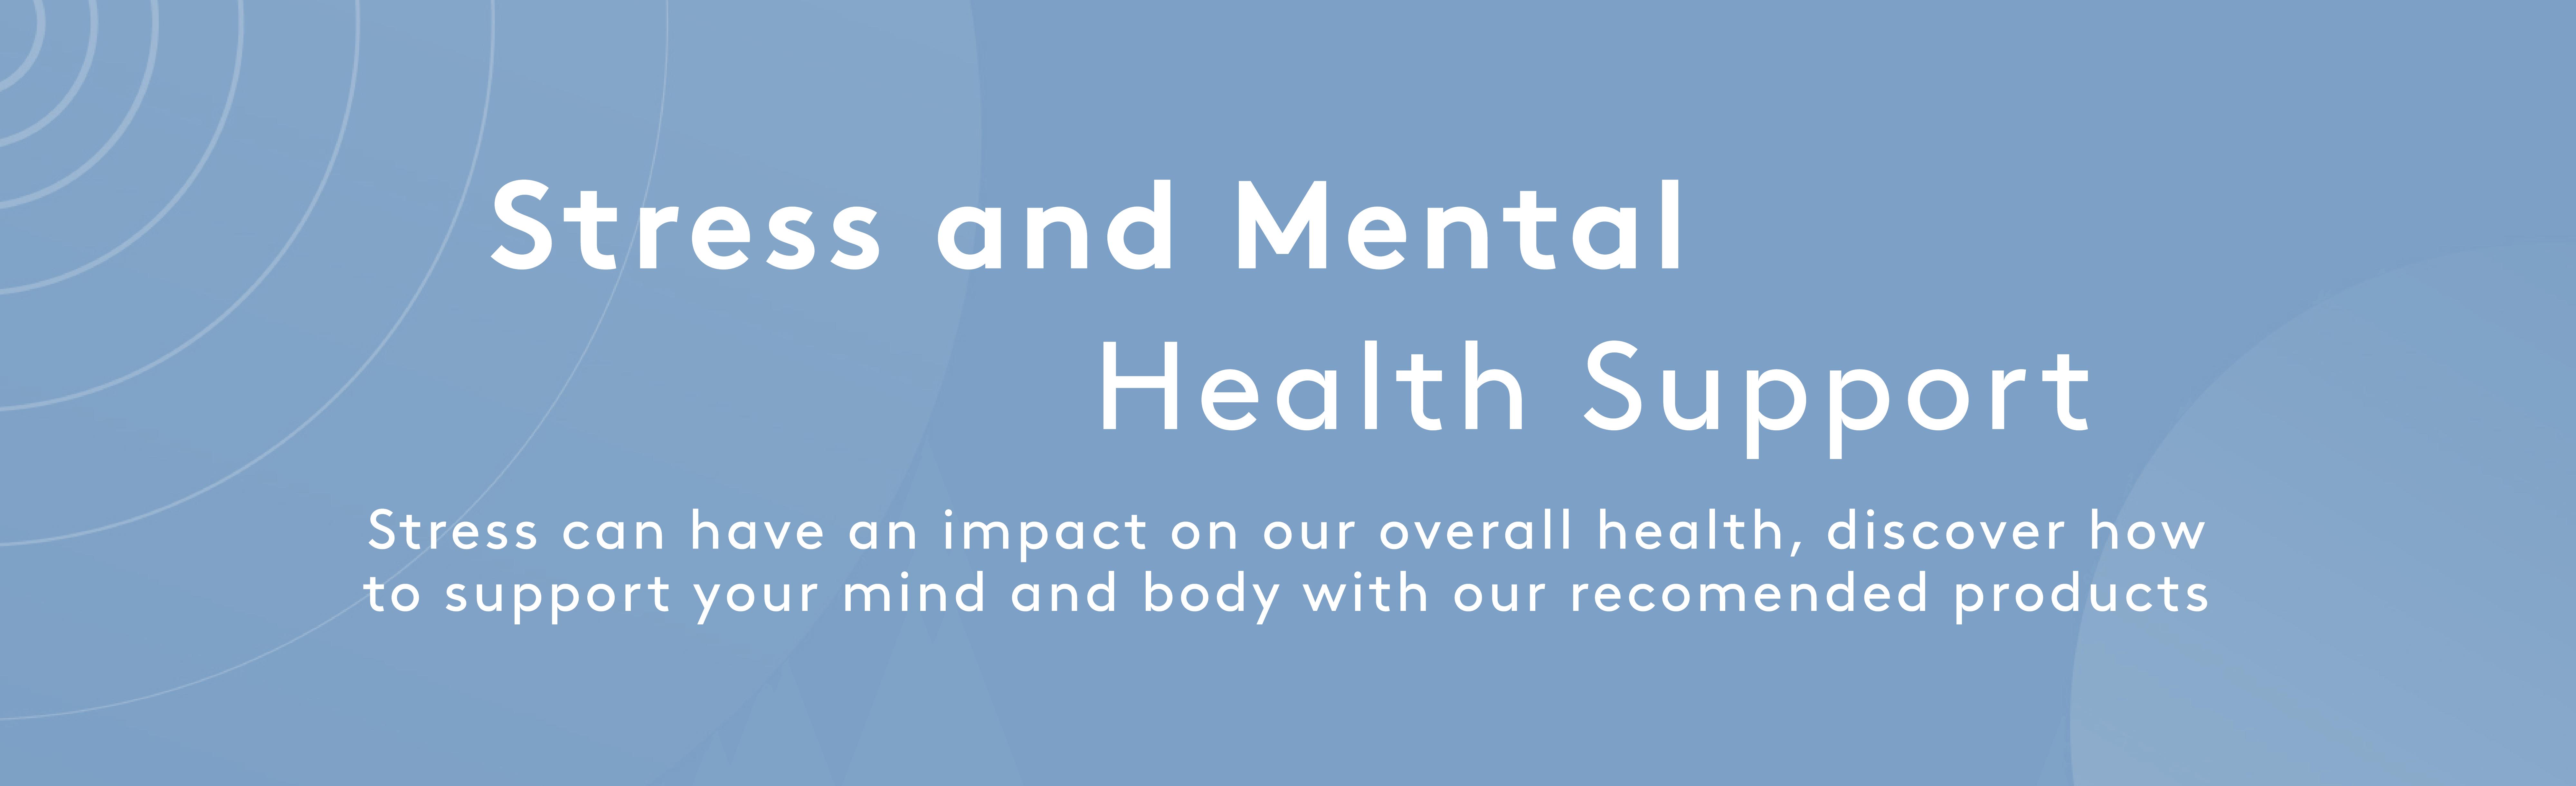 Stress & Mental Health | Myvitamins